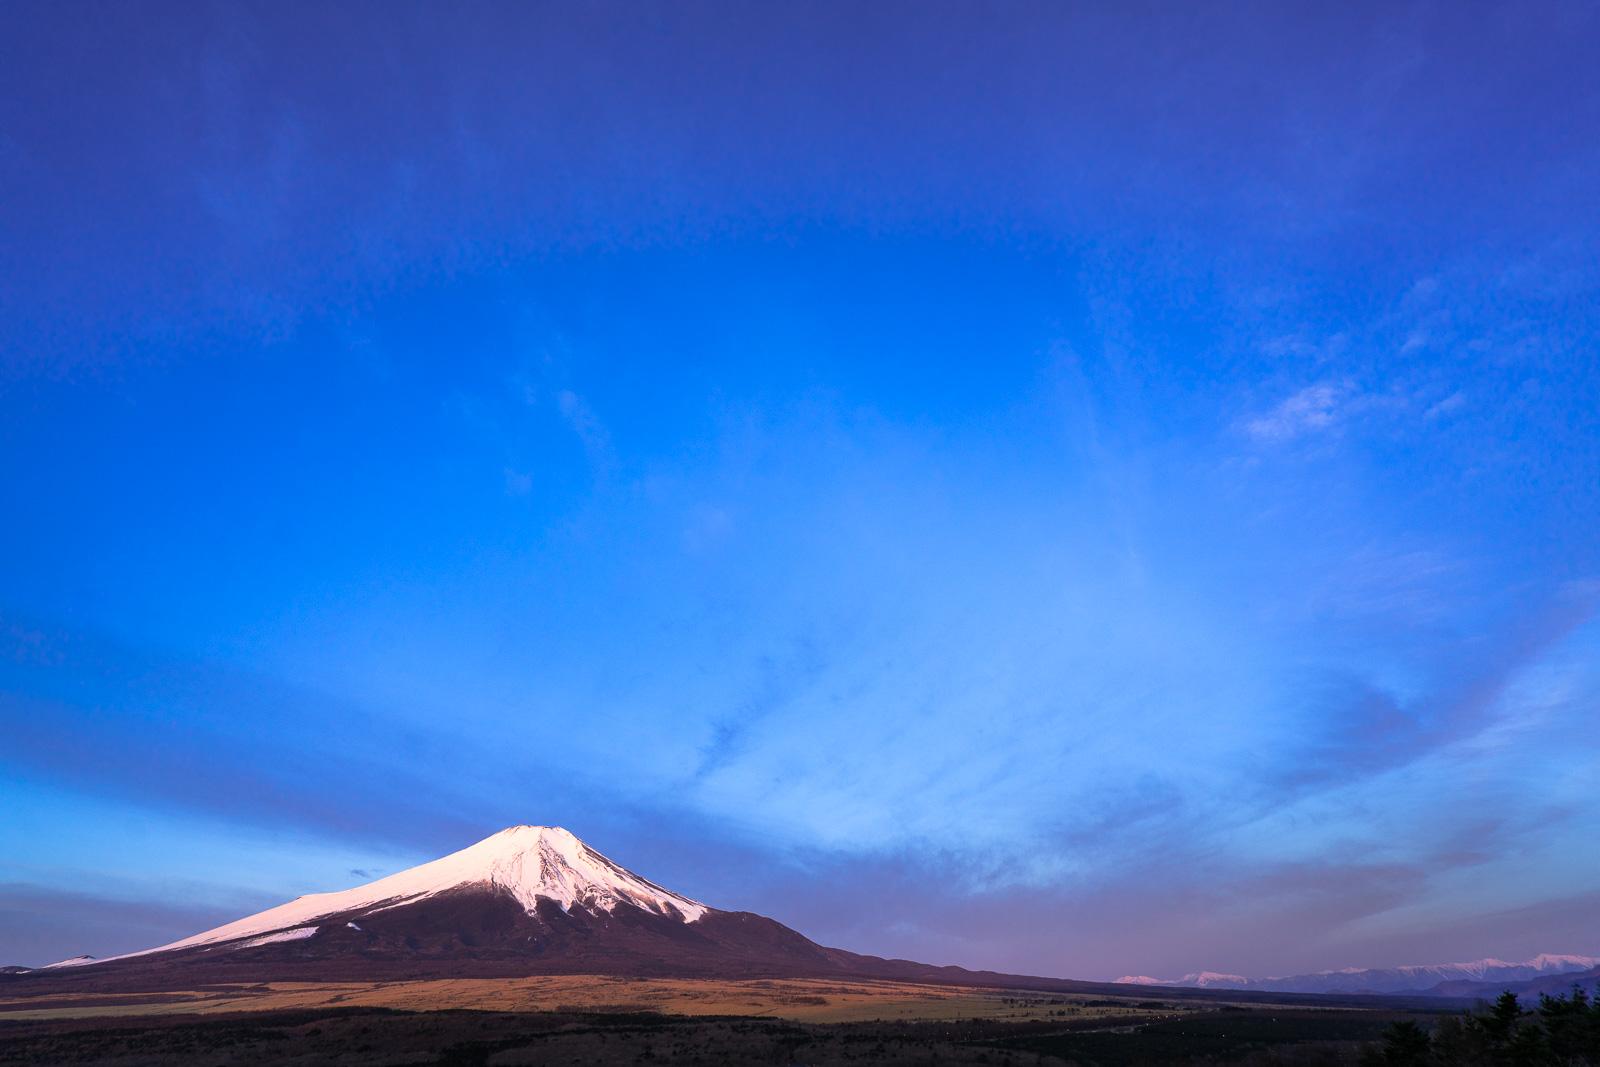 Spring Break '19 Days 13 and 14: Mount Fuji